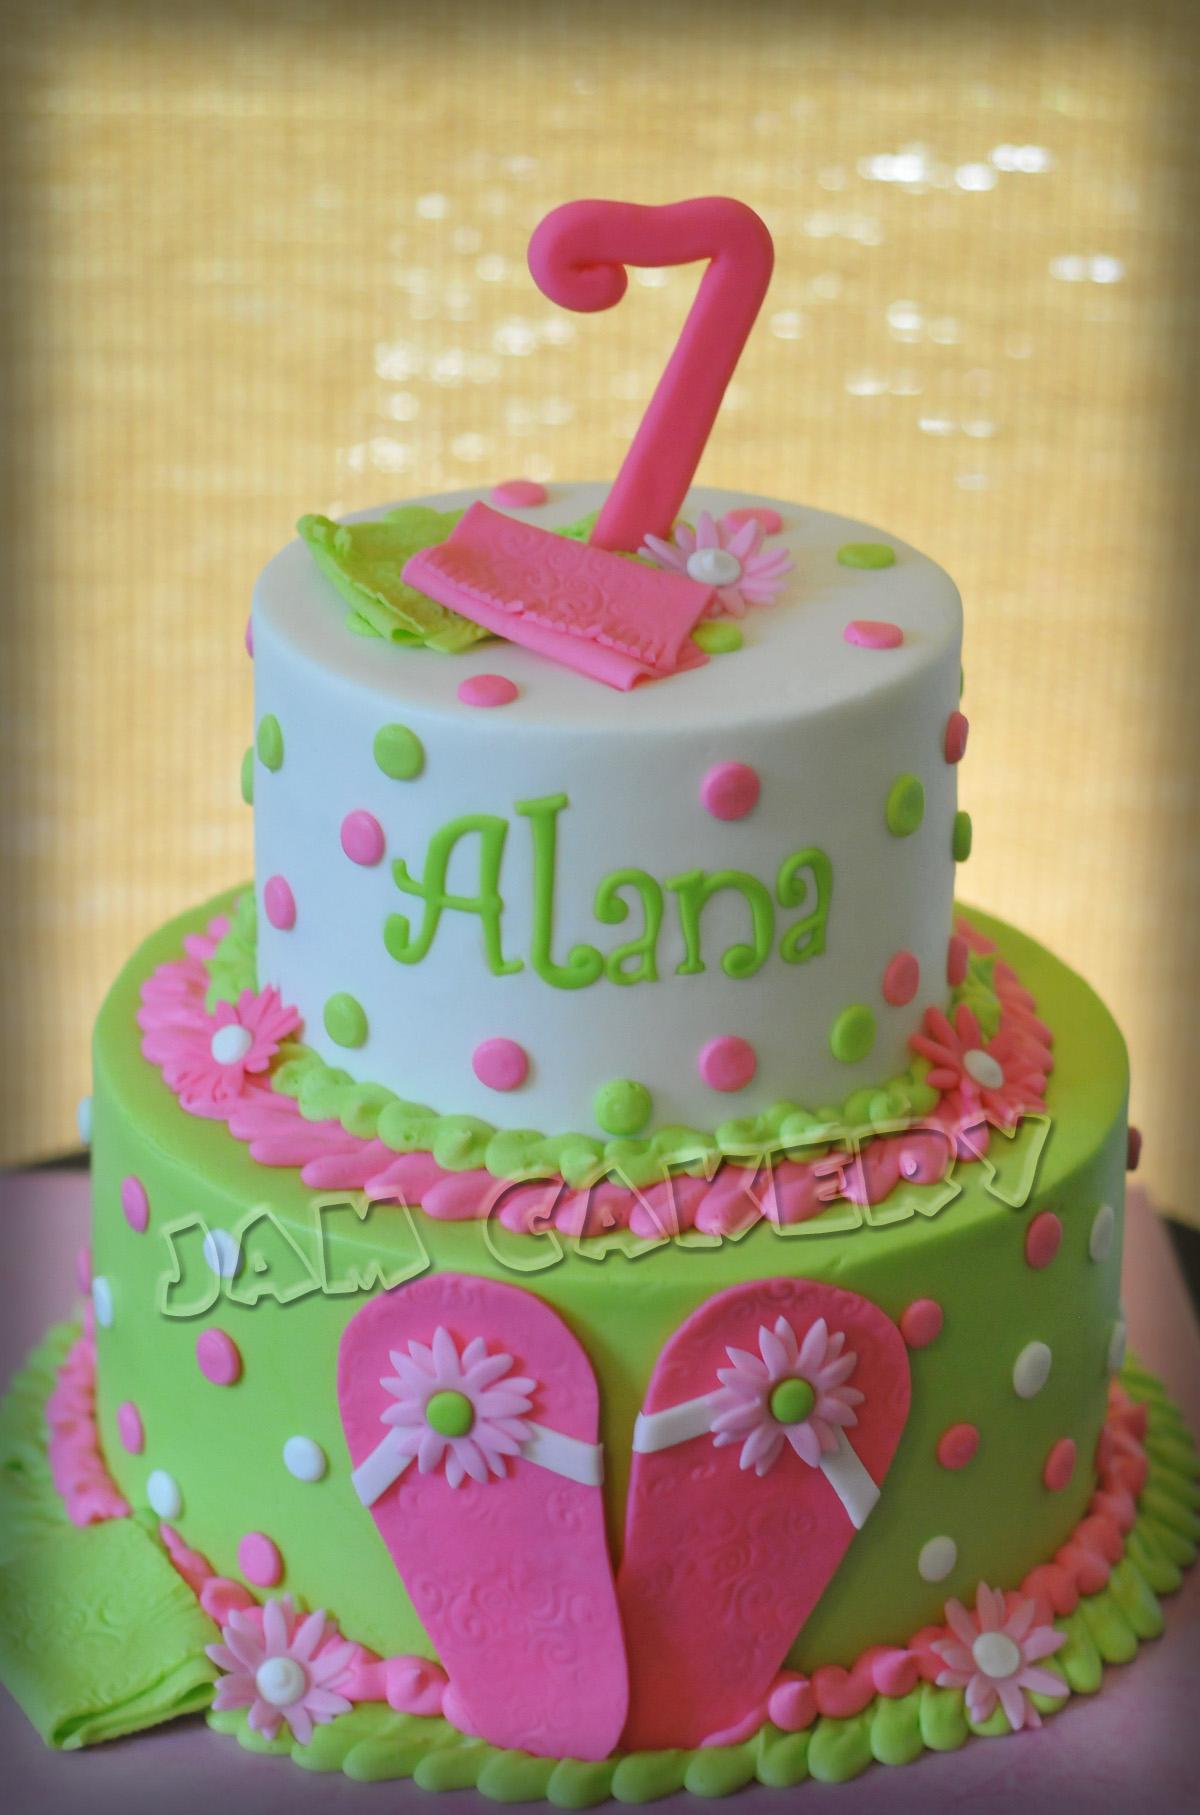 Admirable Summer Flip Flops Birthday Cake J A M Cakery Birthday Cards Printable Inklcafe Filternl